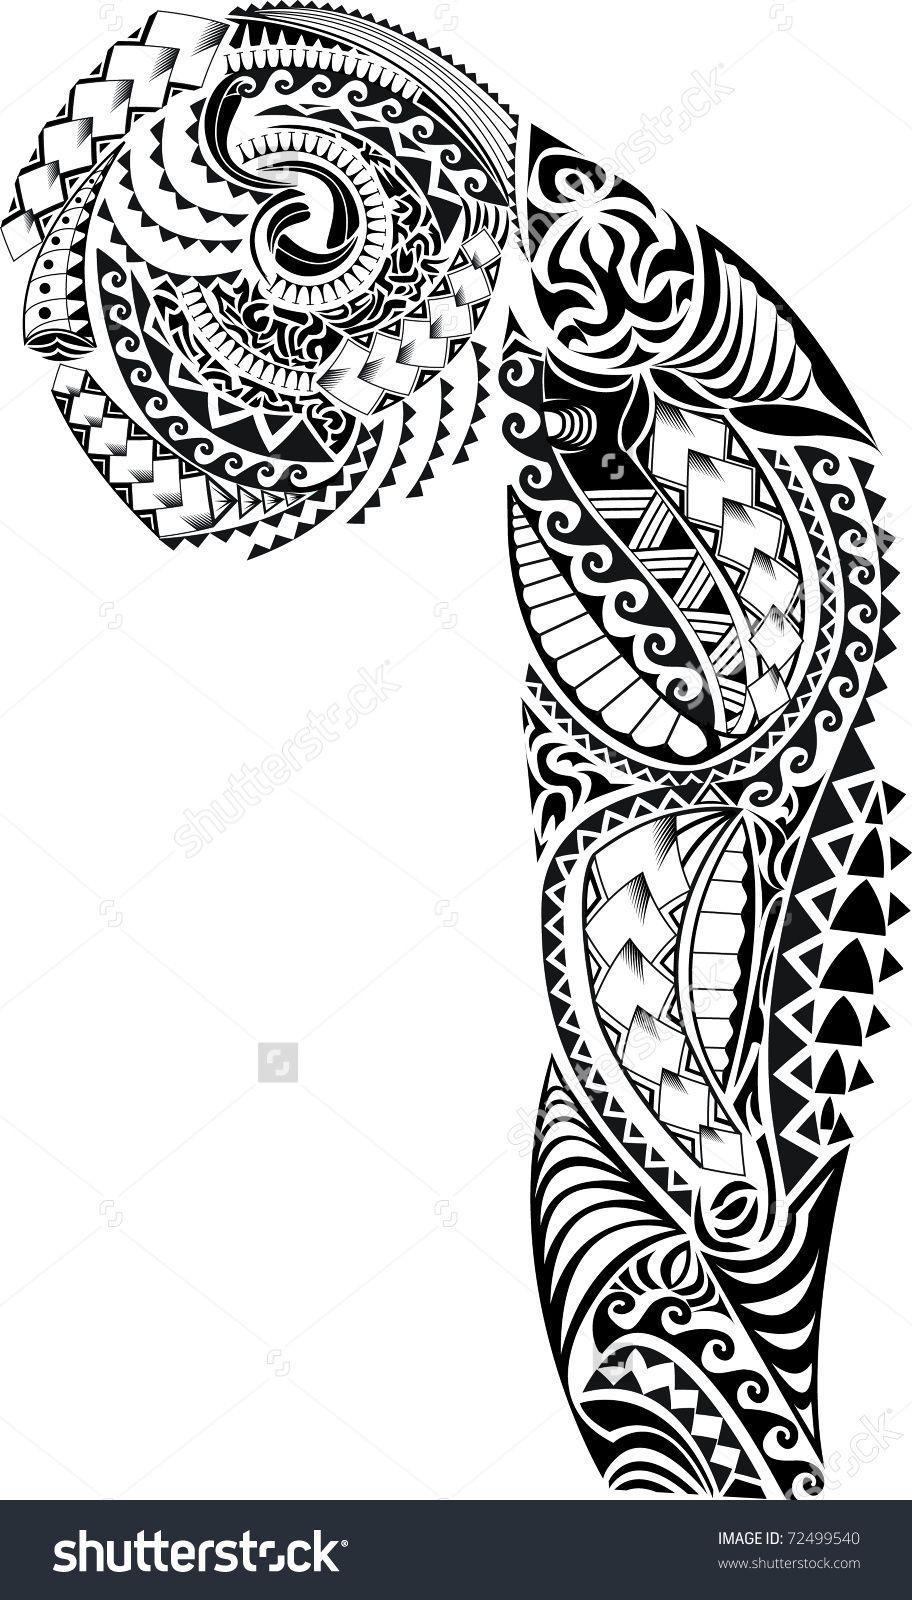 Tribal Arm Chest Tattoo Tribal Sleeve Tattoos Half Sleeve Tattoos Designs Maori Tattoo Designs